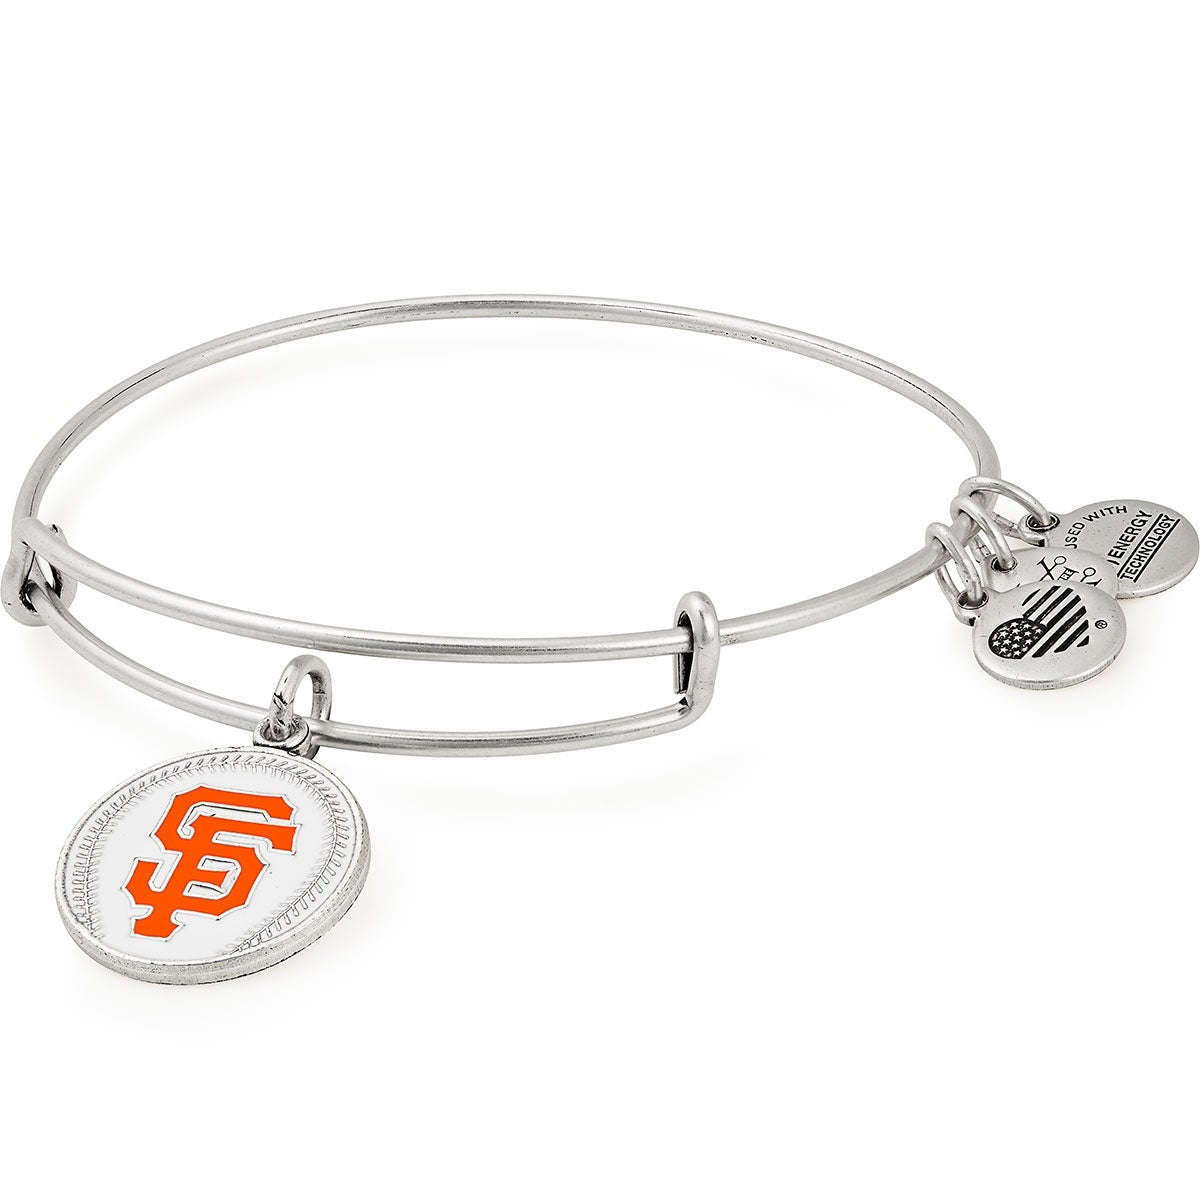 Swamp Fox Philadelphia Eagles Copper Alloy Bracelet with Team Glass Charm